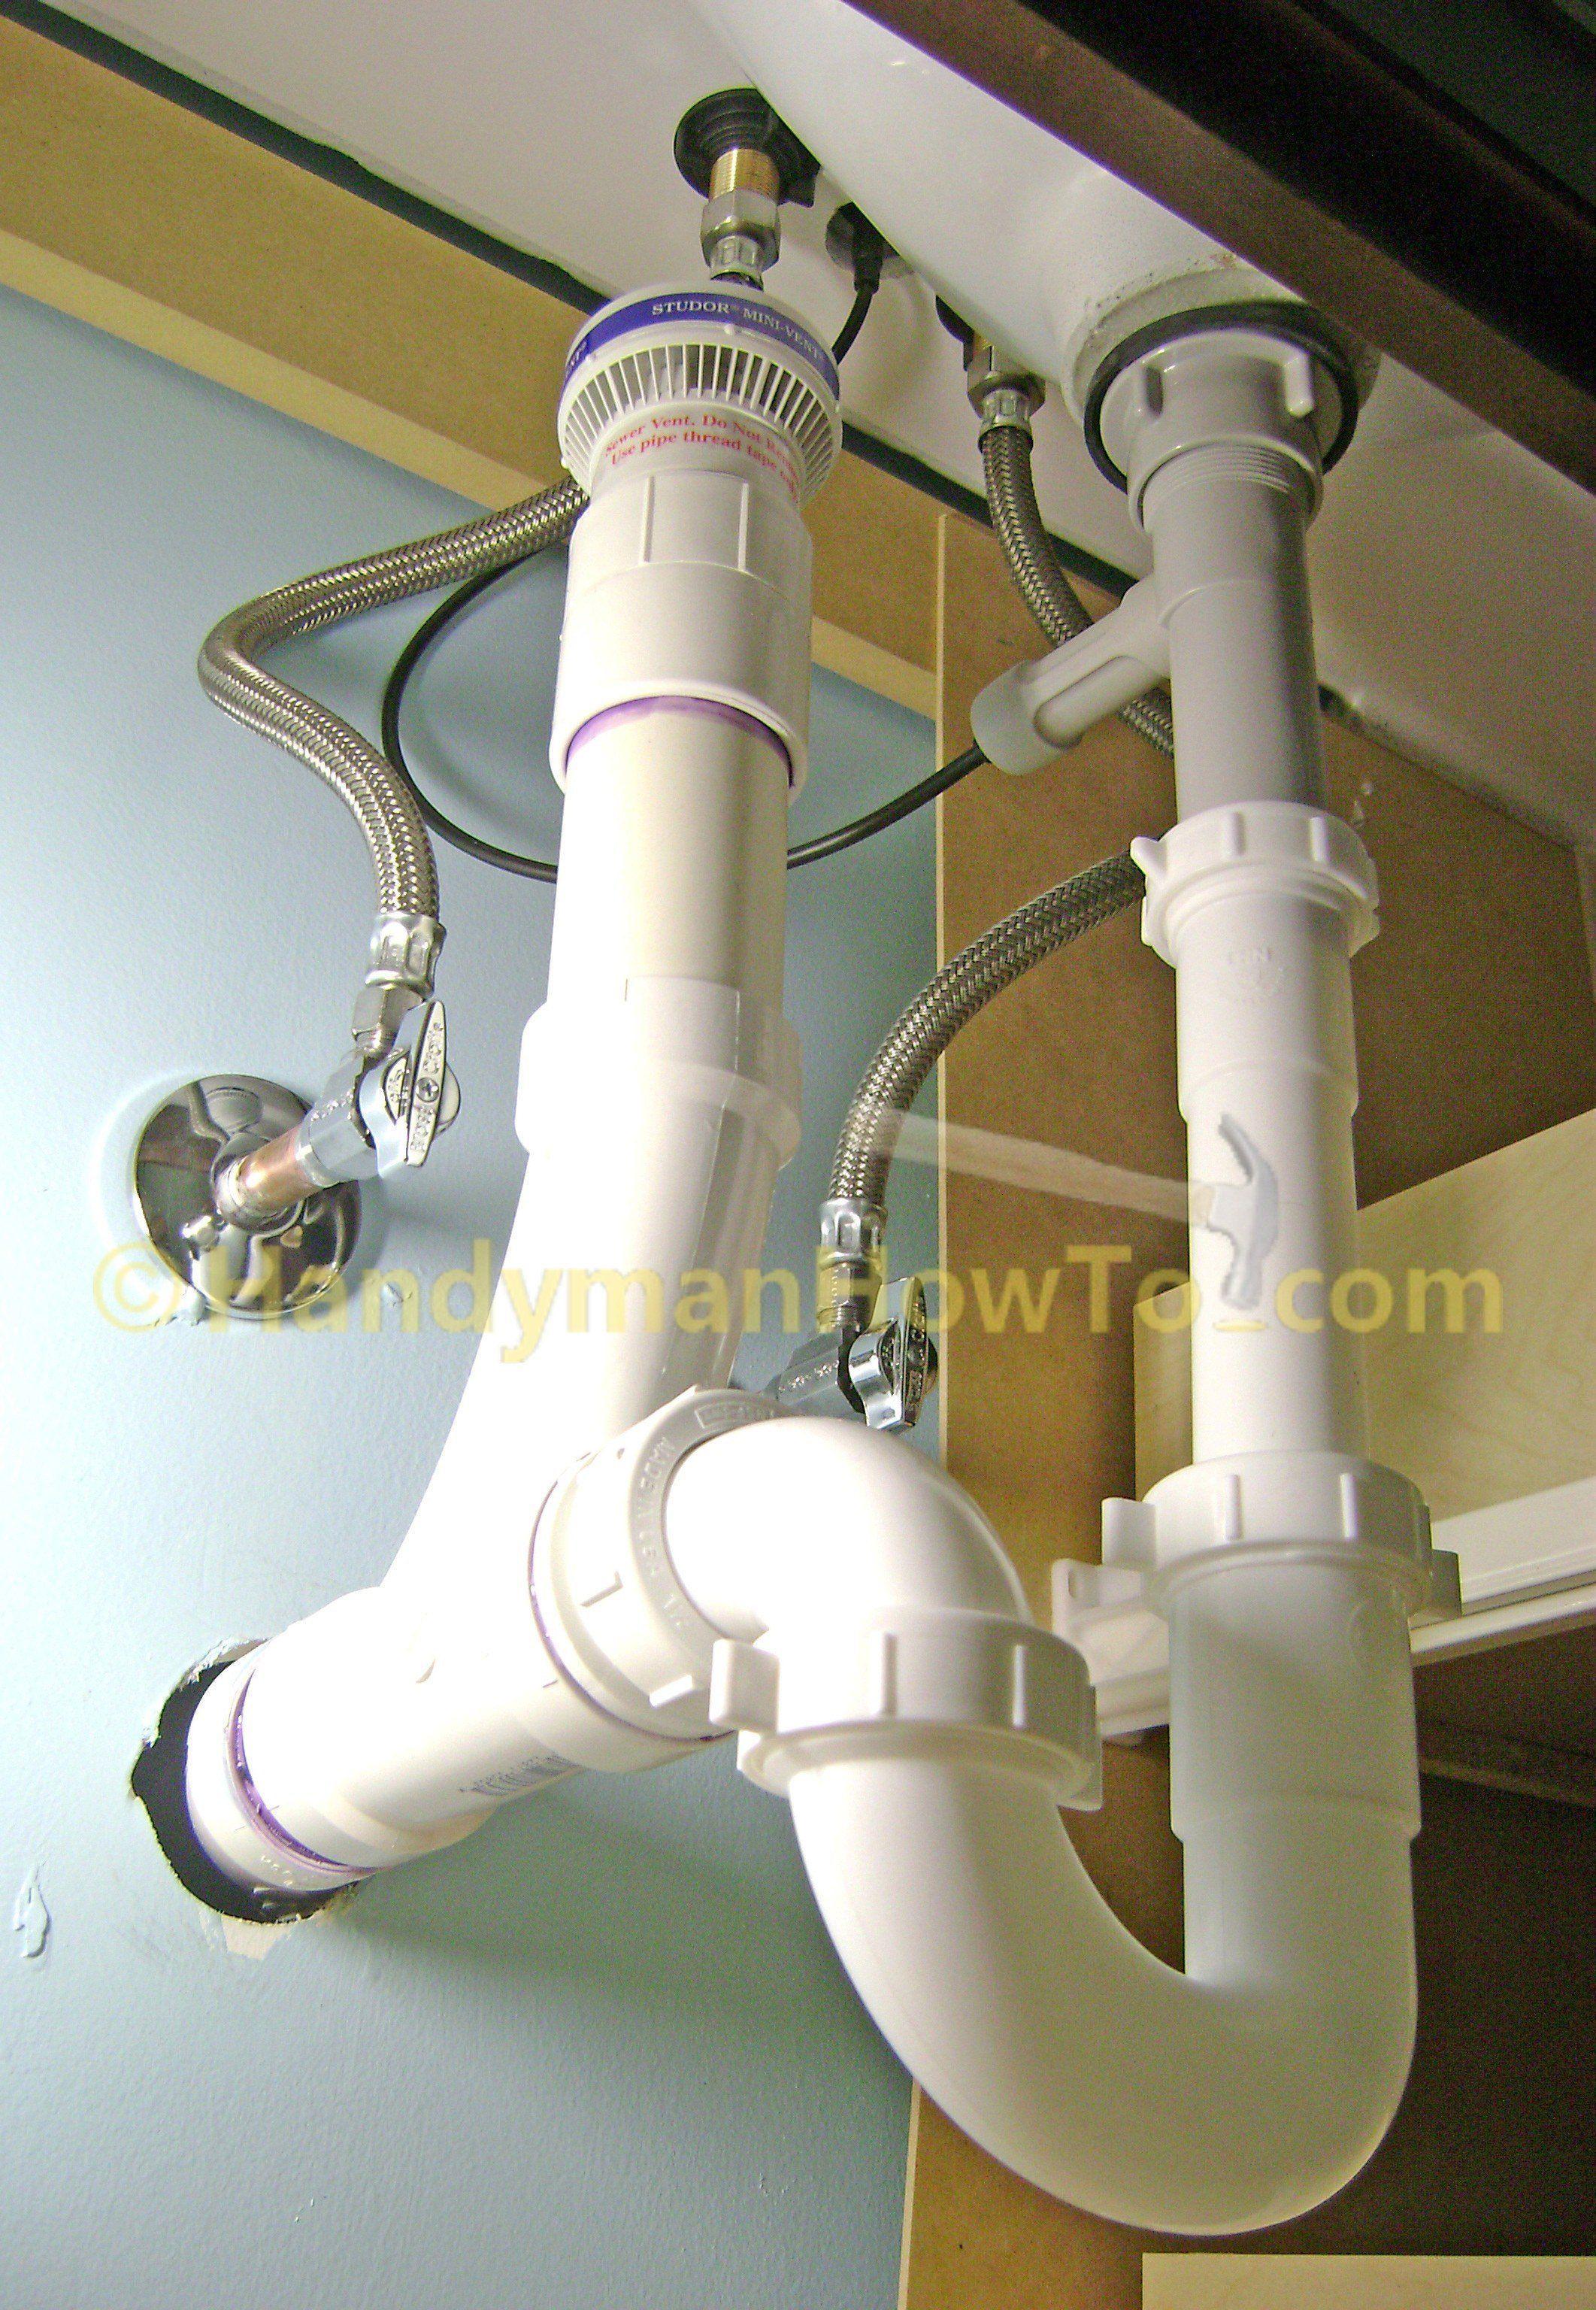 Plomberie Salle De Bain Sous Sol how to finish a basement bathroom: install the bathroom